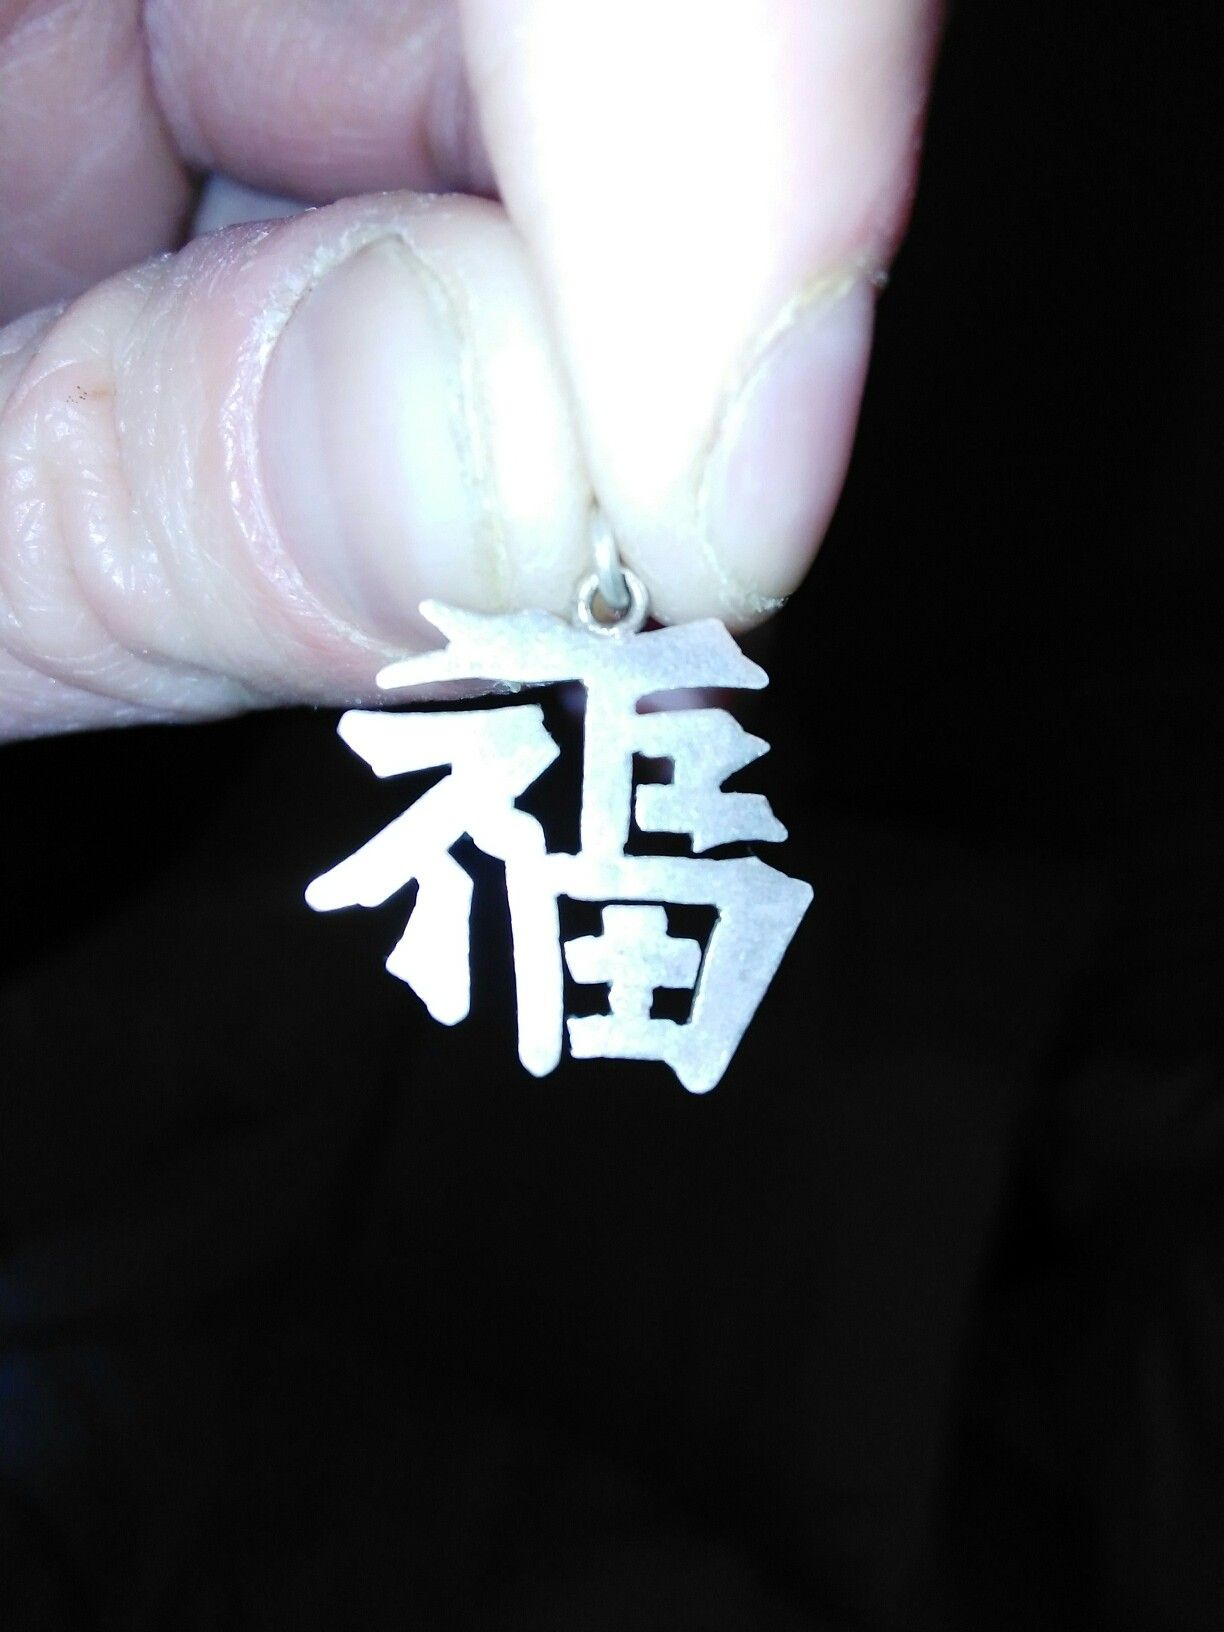 Pin By Sarah Cruz On Chinese Symbols Pinterest Chinese Symbols